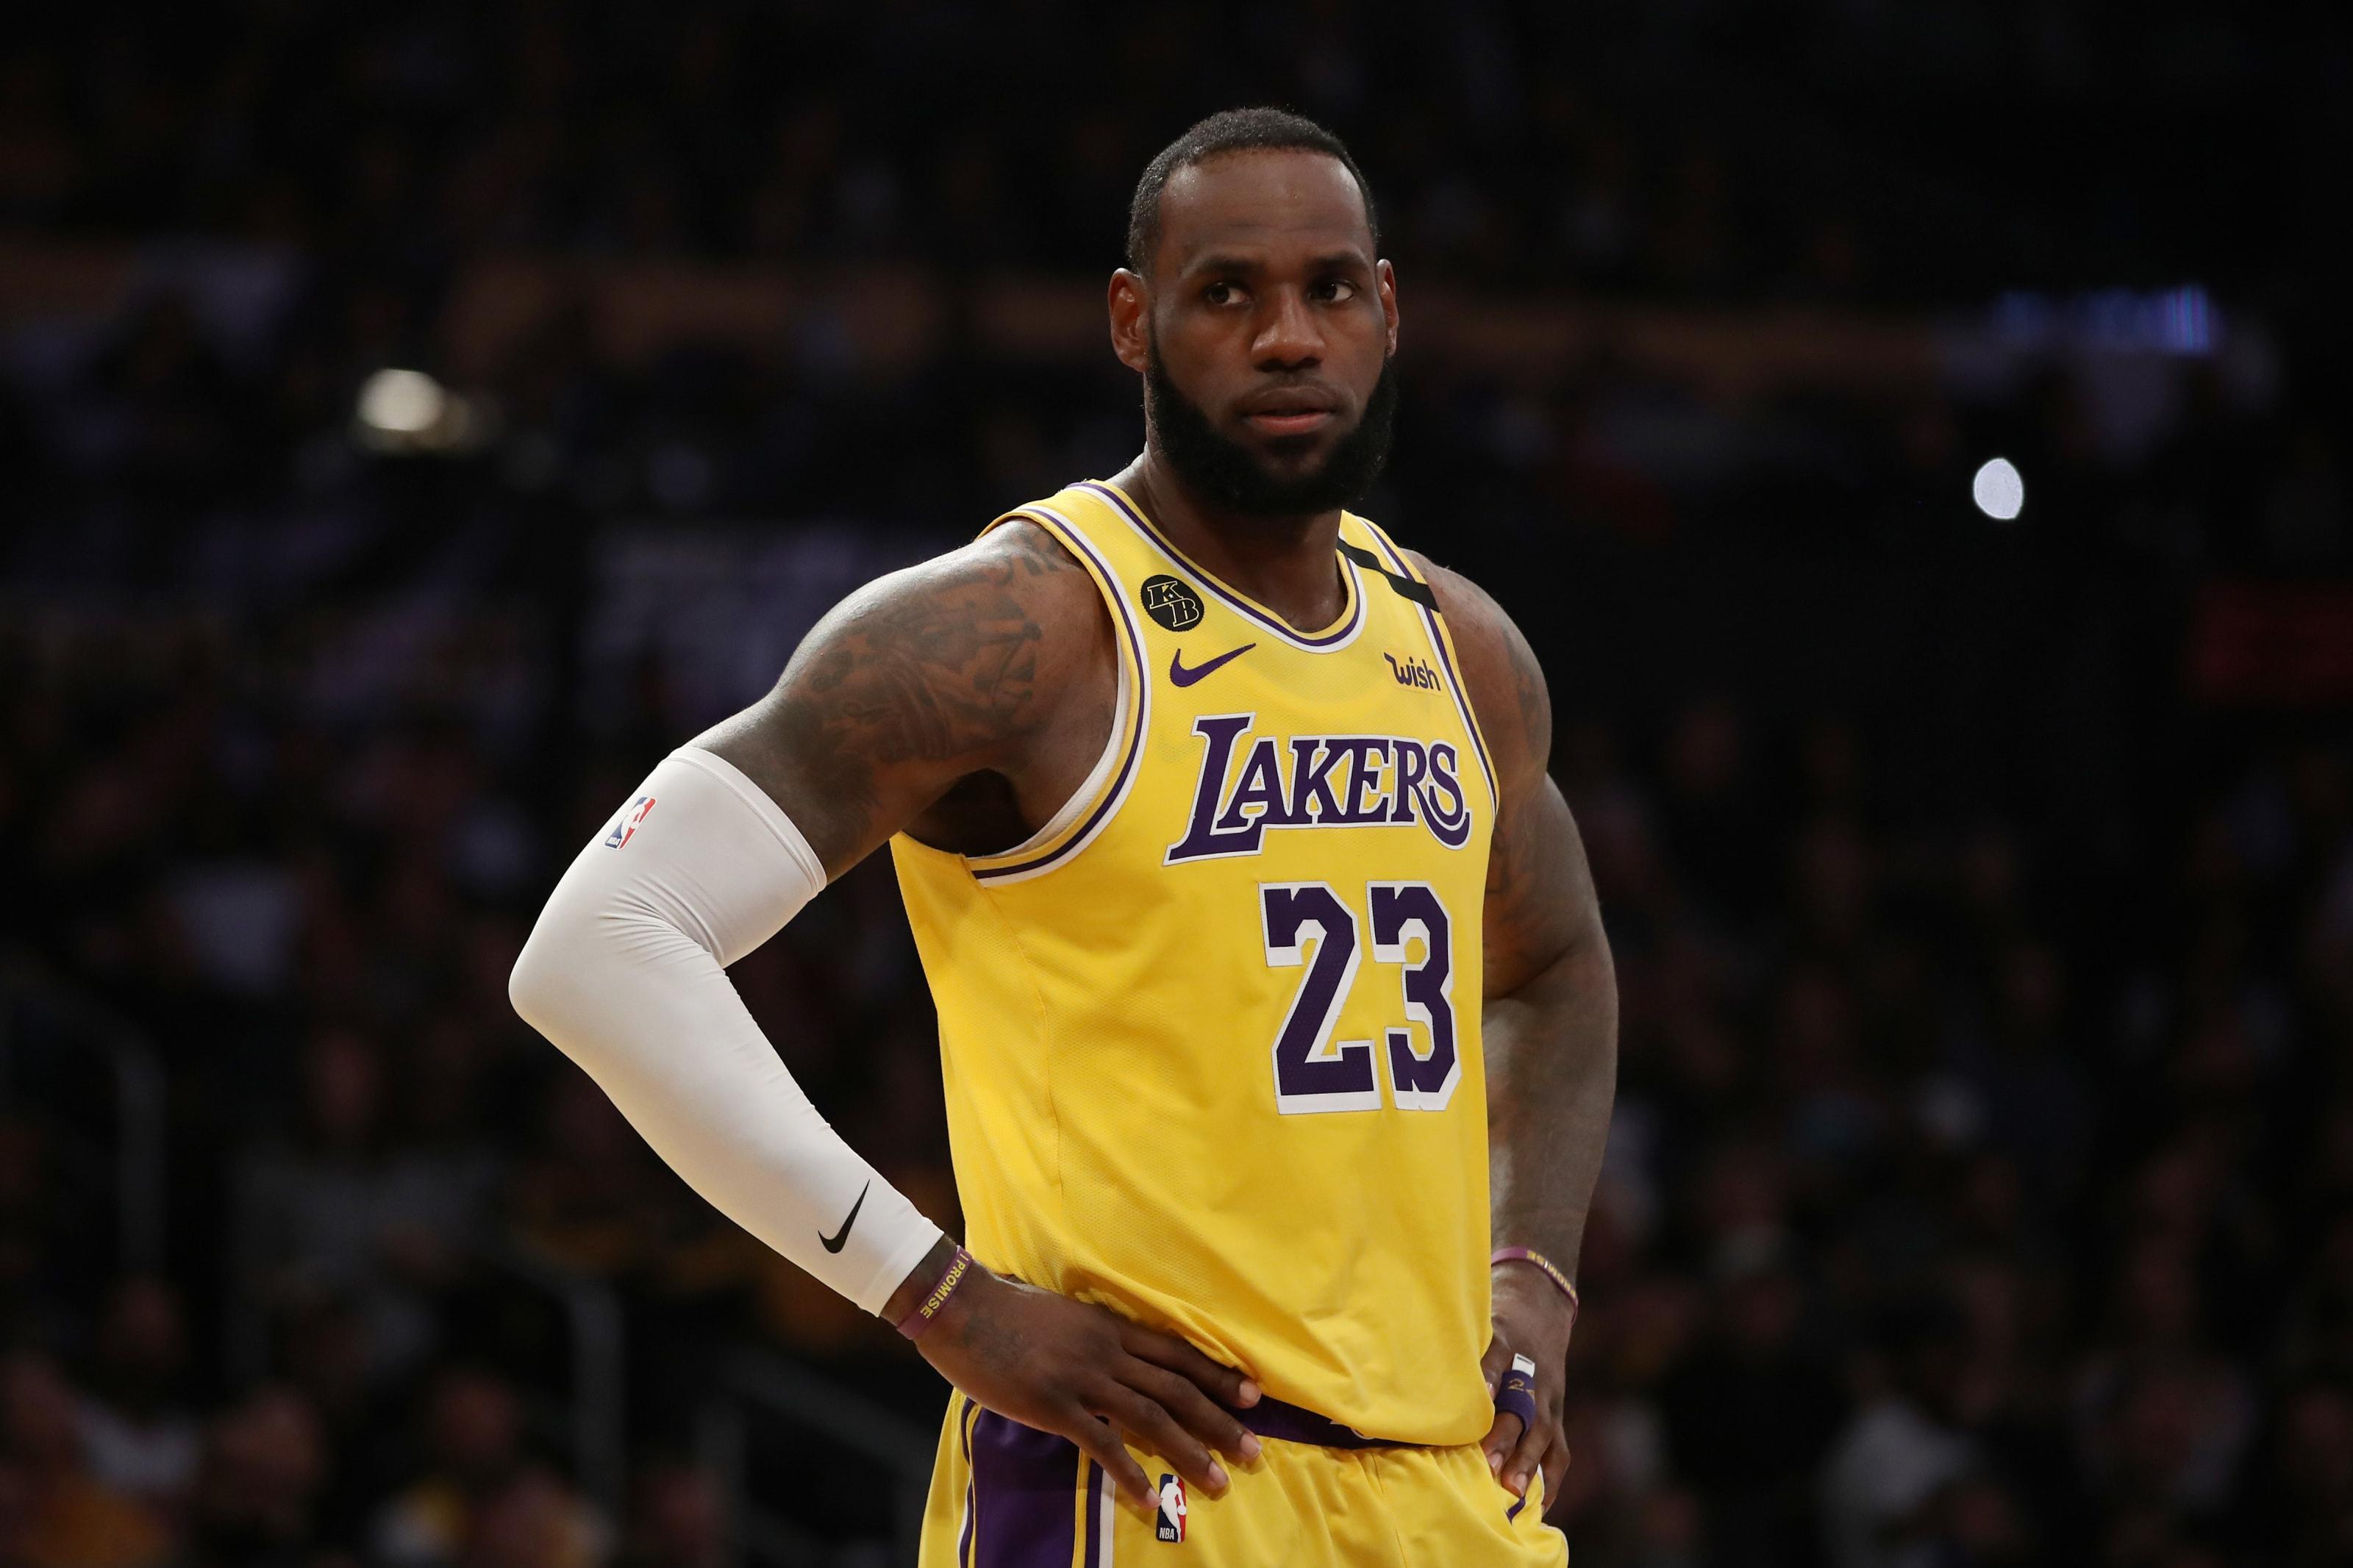 LeBron James' 10 best performances of